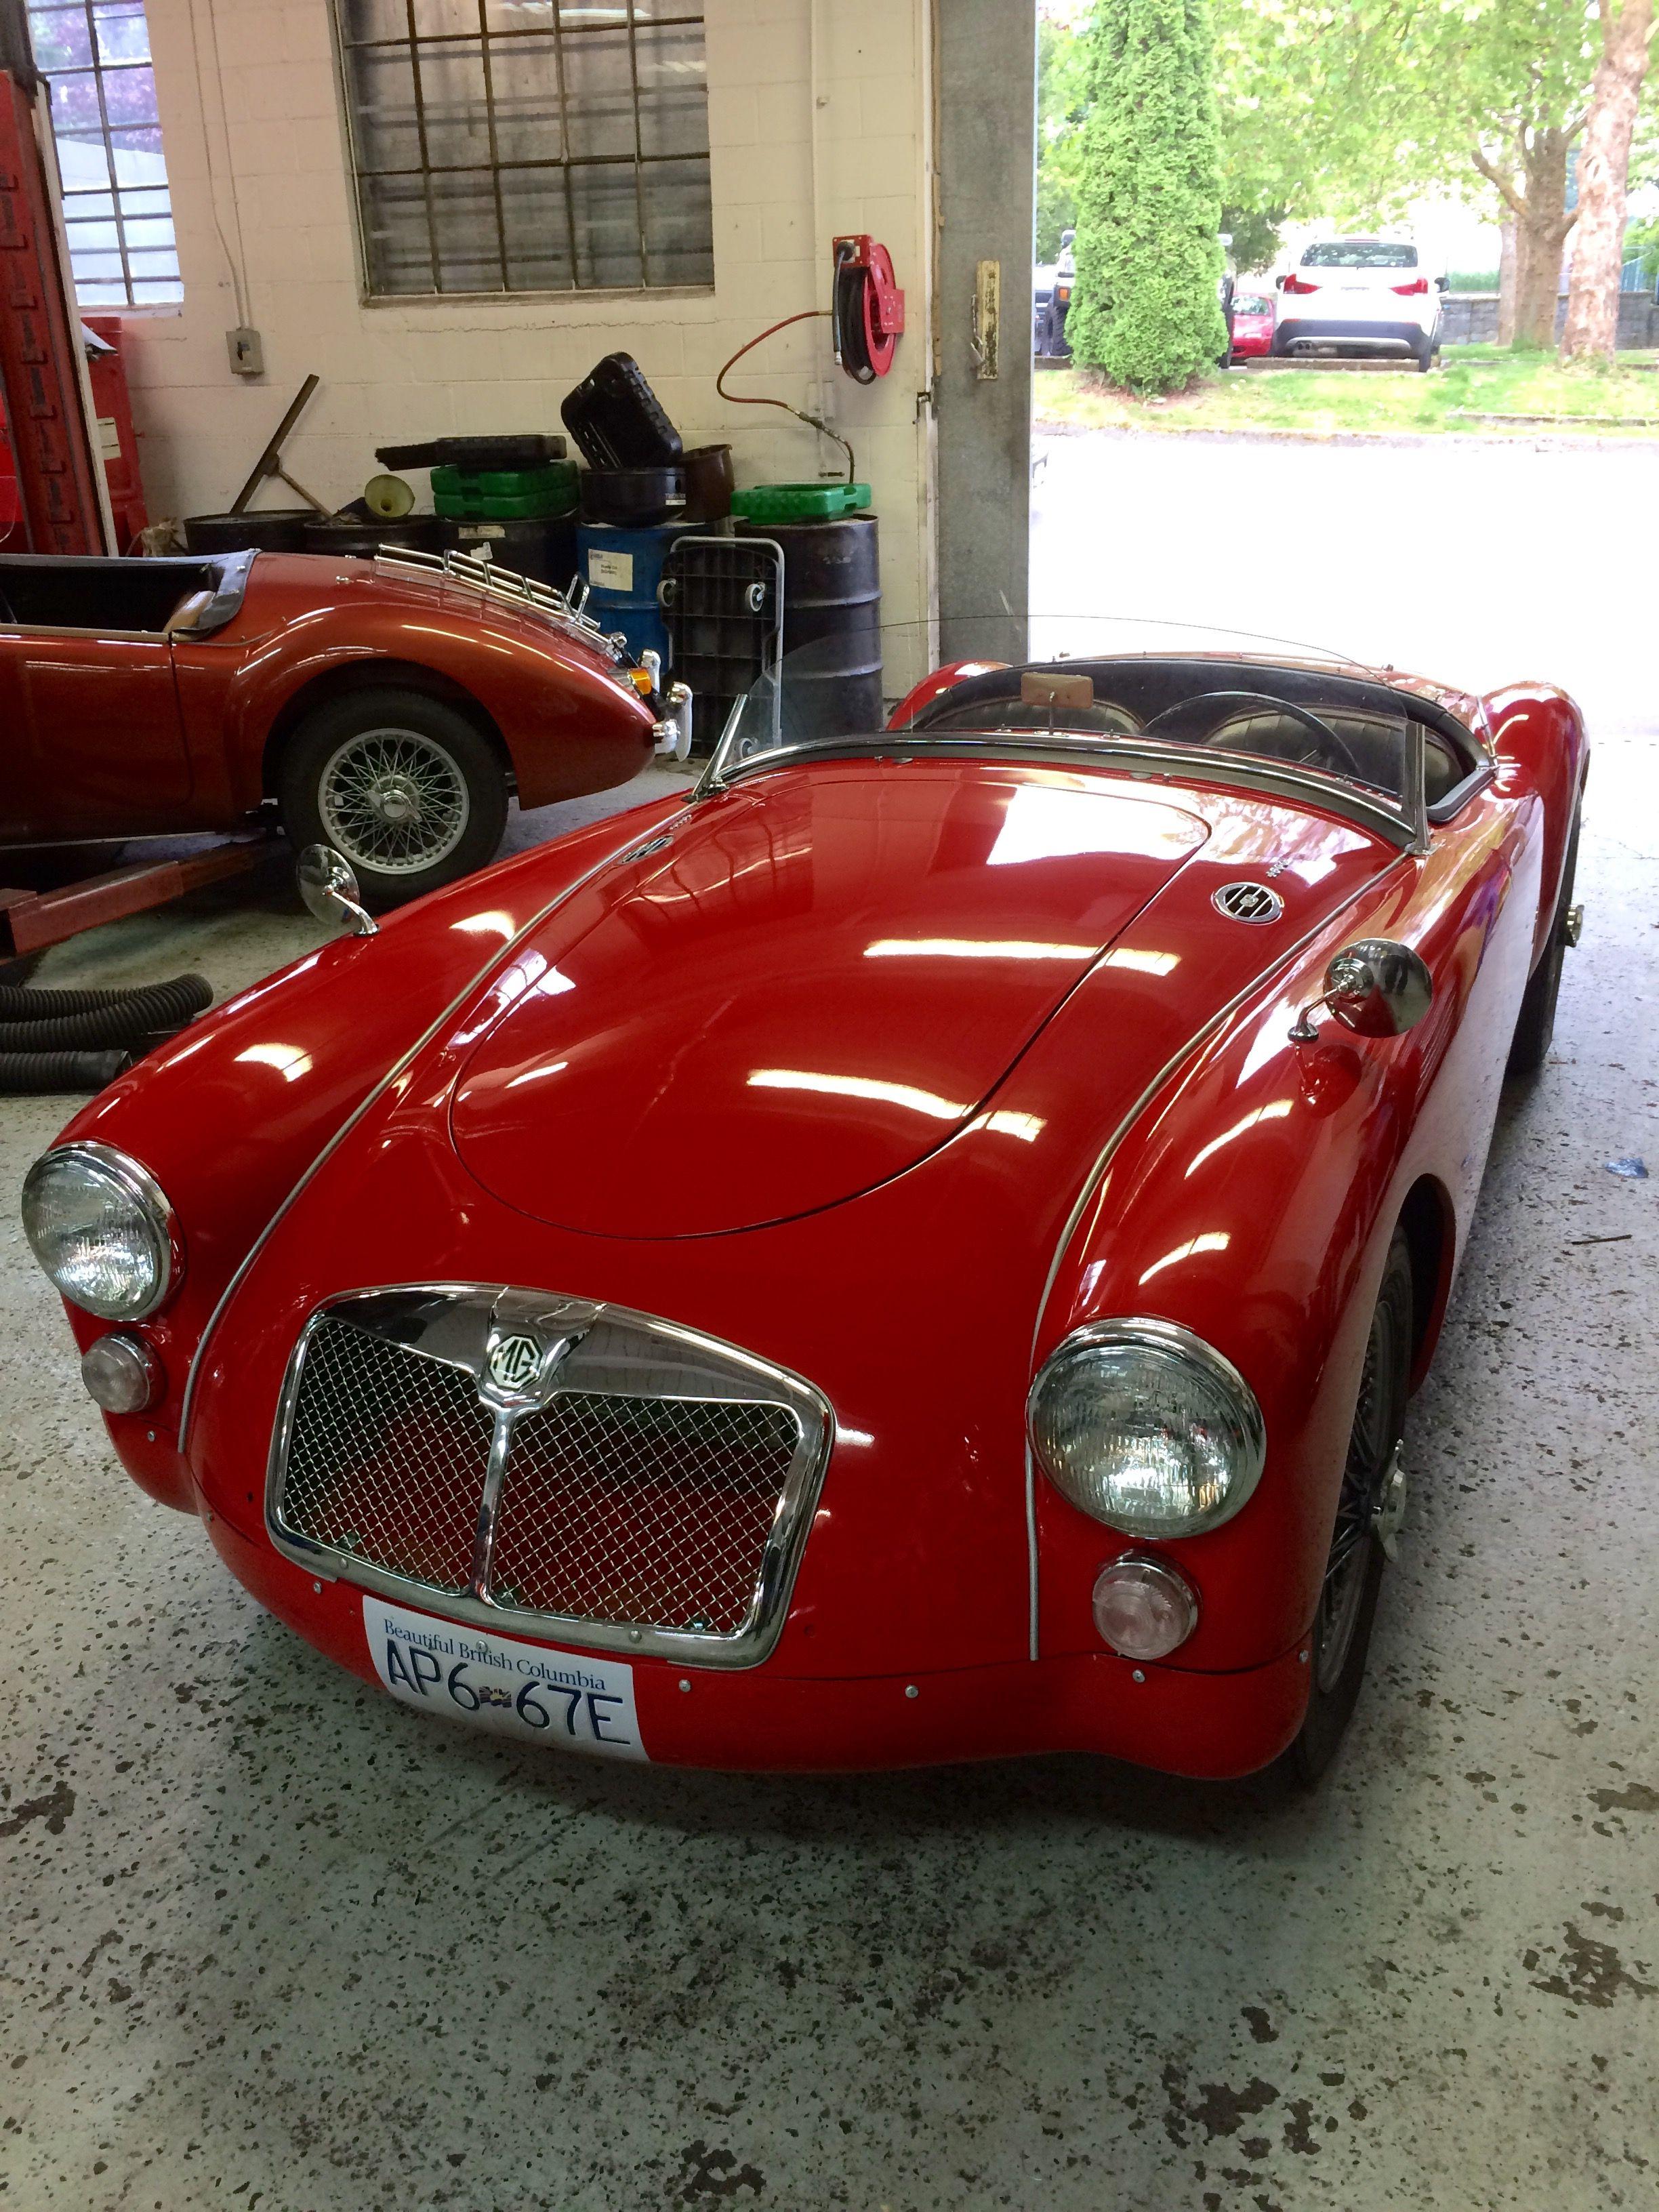 ecbda771595 Red MGA racing | Sports Cars | Vintage sports cars, Vintage cars, Cars